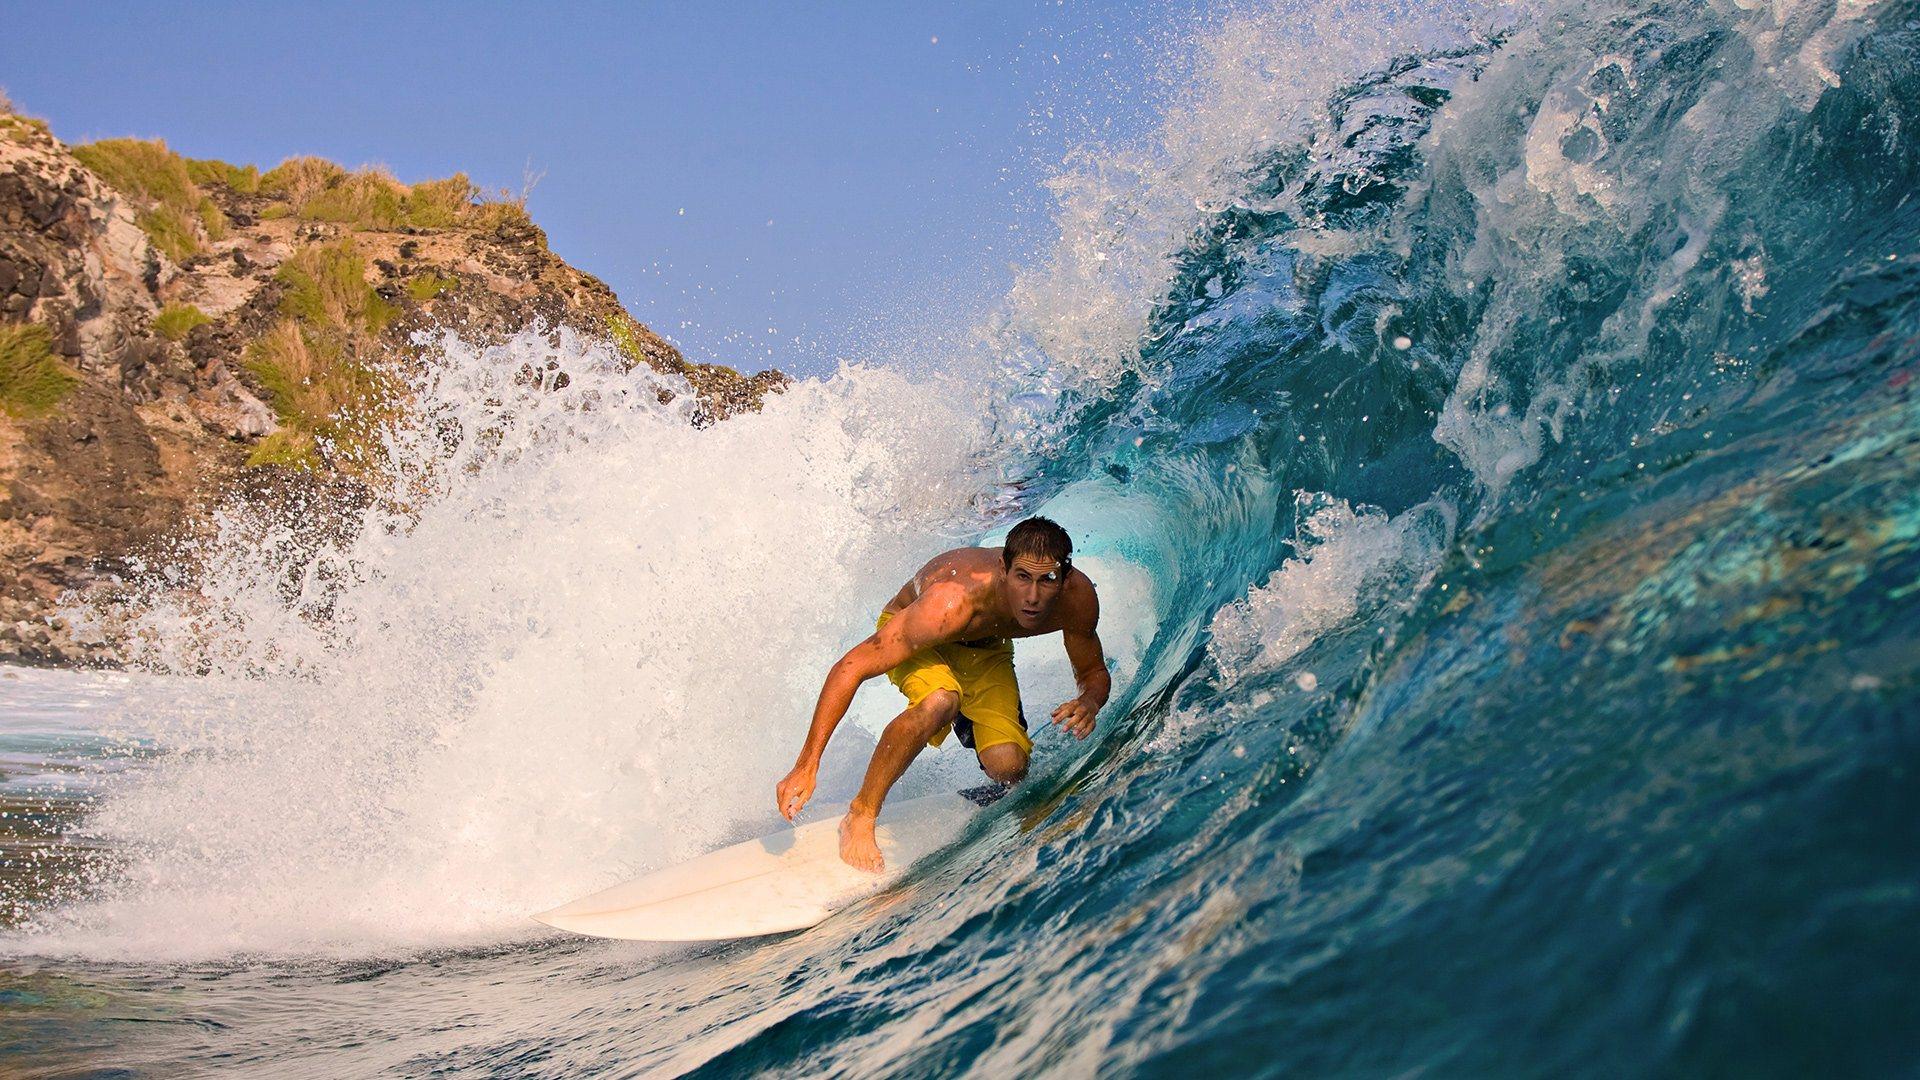 http://4.bp.blogspot.com/-59HEPVkXxUs/UJvSUn4zc_I/AAAAAAAAMbs/inC4wI_68qw/s1920/surfing_on_water_hd-wallpaper.jpg